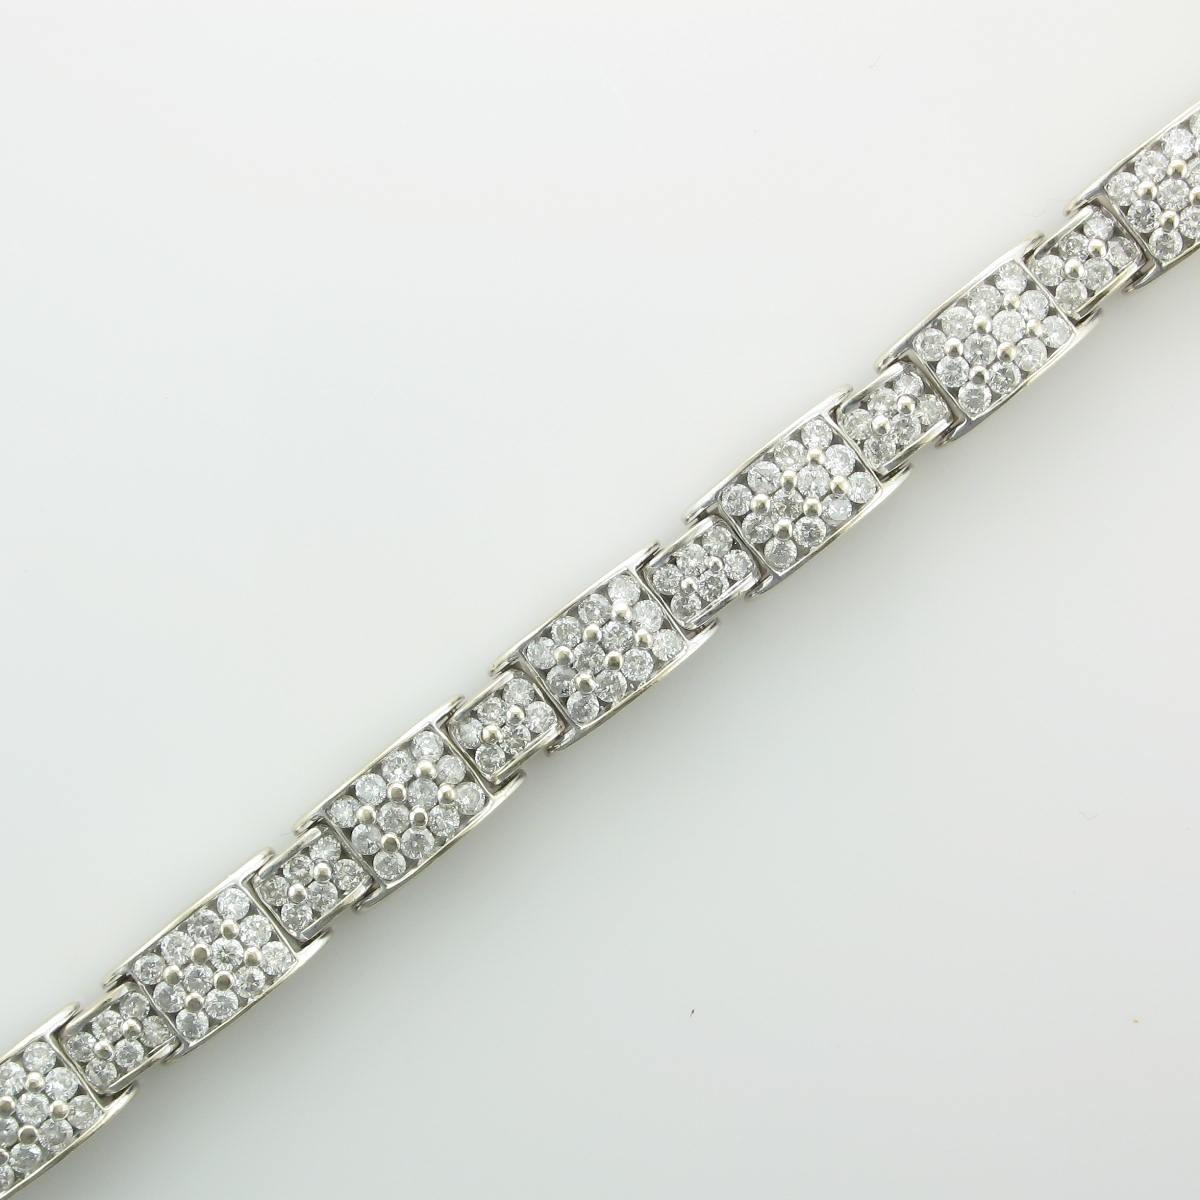 7.0tcw Diamond Bracelet set in 14K White Gold